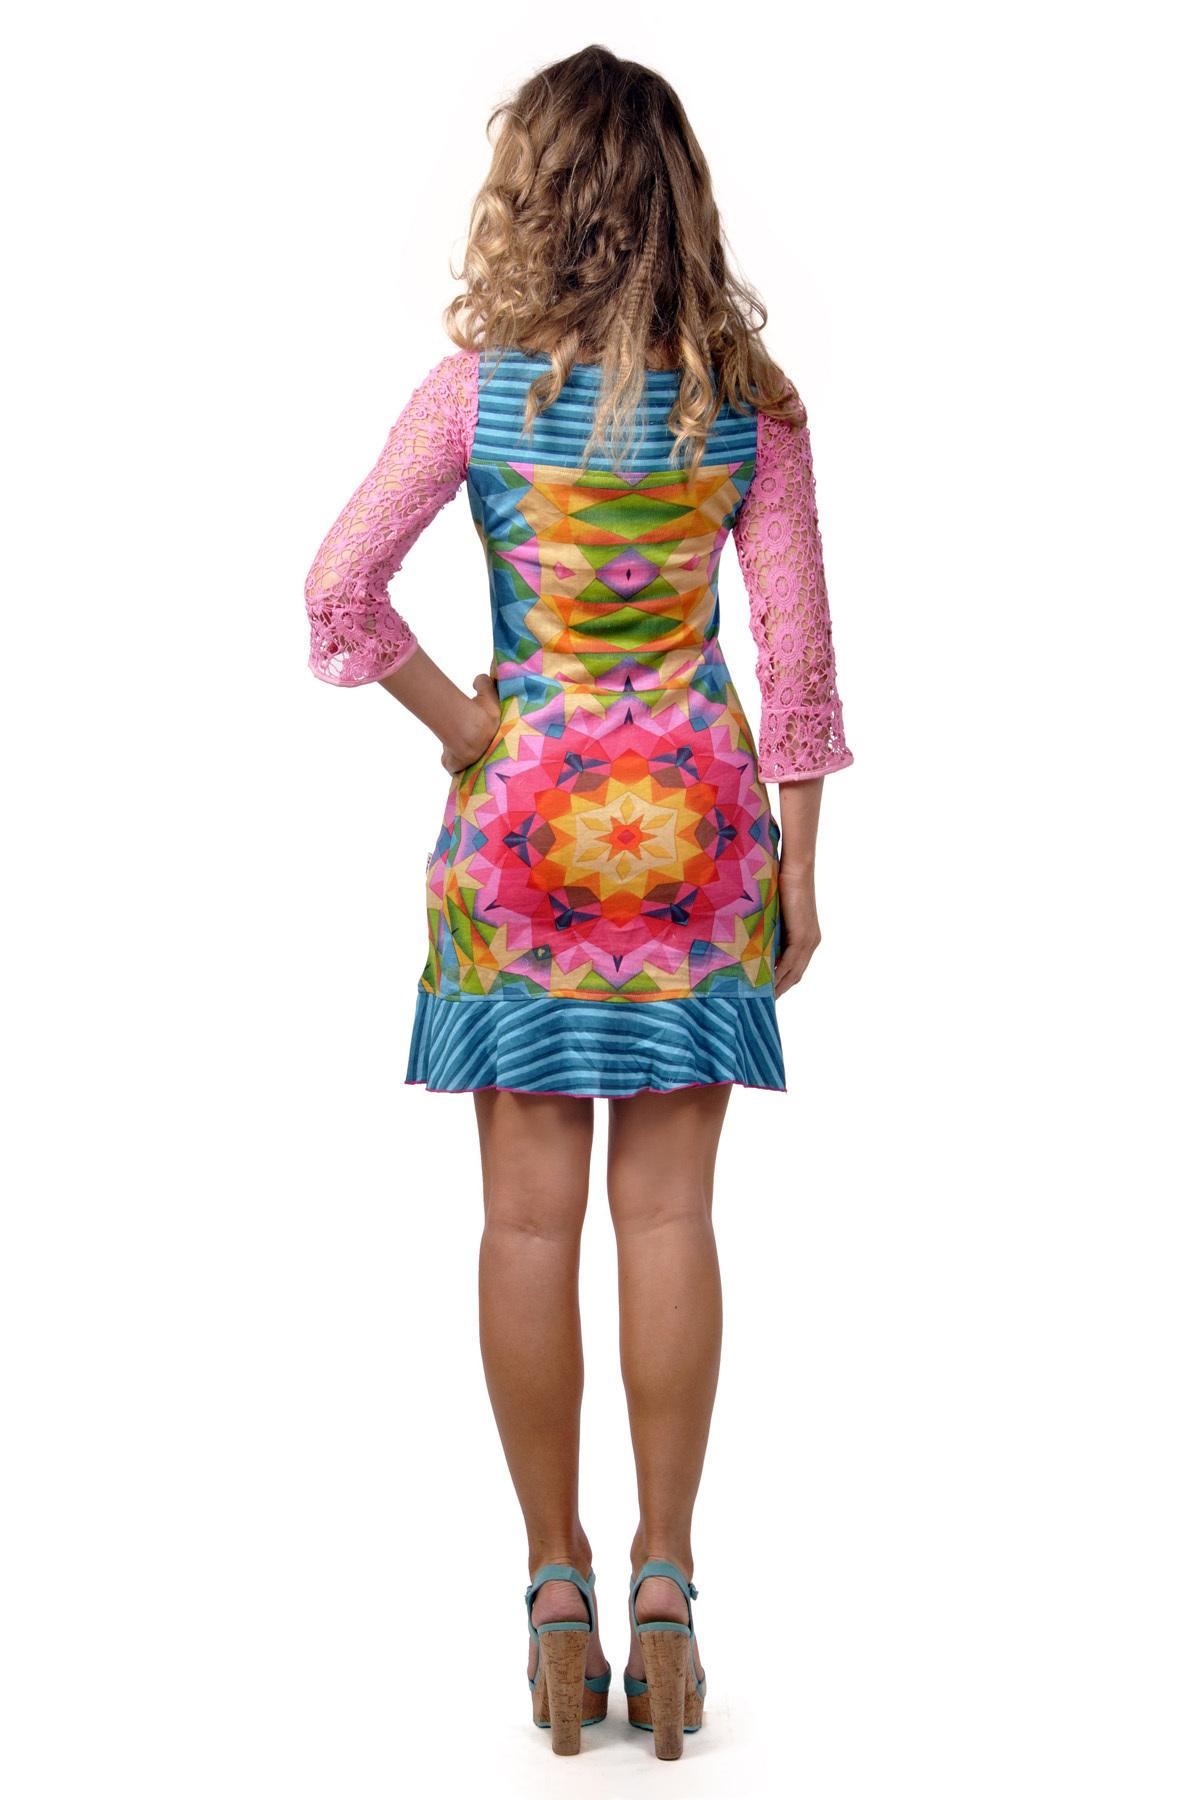 Savage Culture: Pink Rosette Delicate Dakota Dress (Almost Gone!)